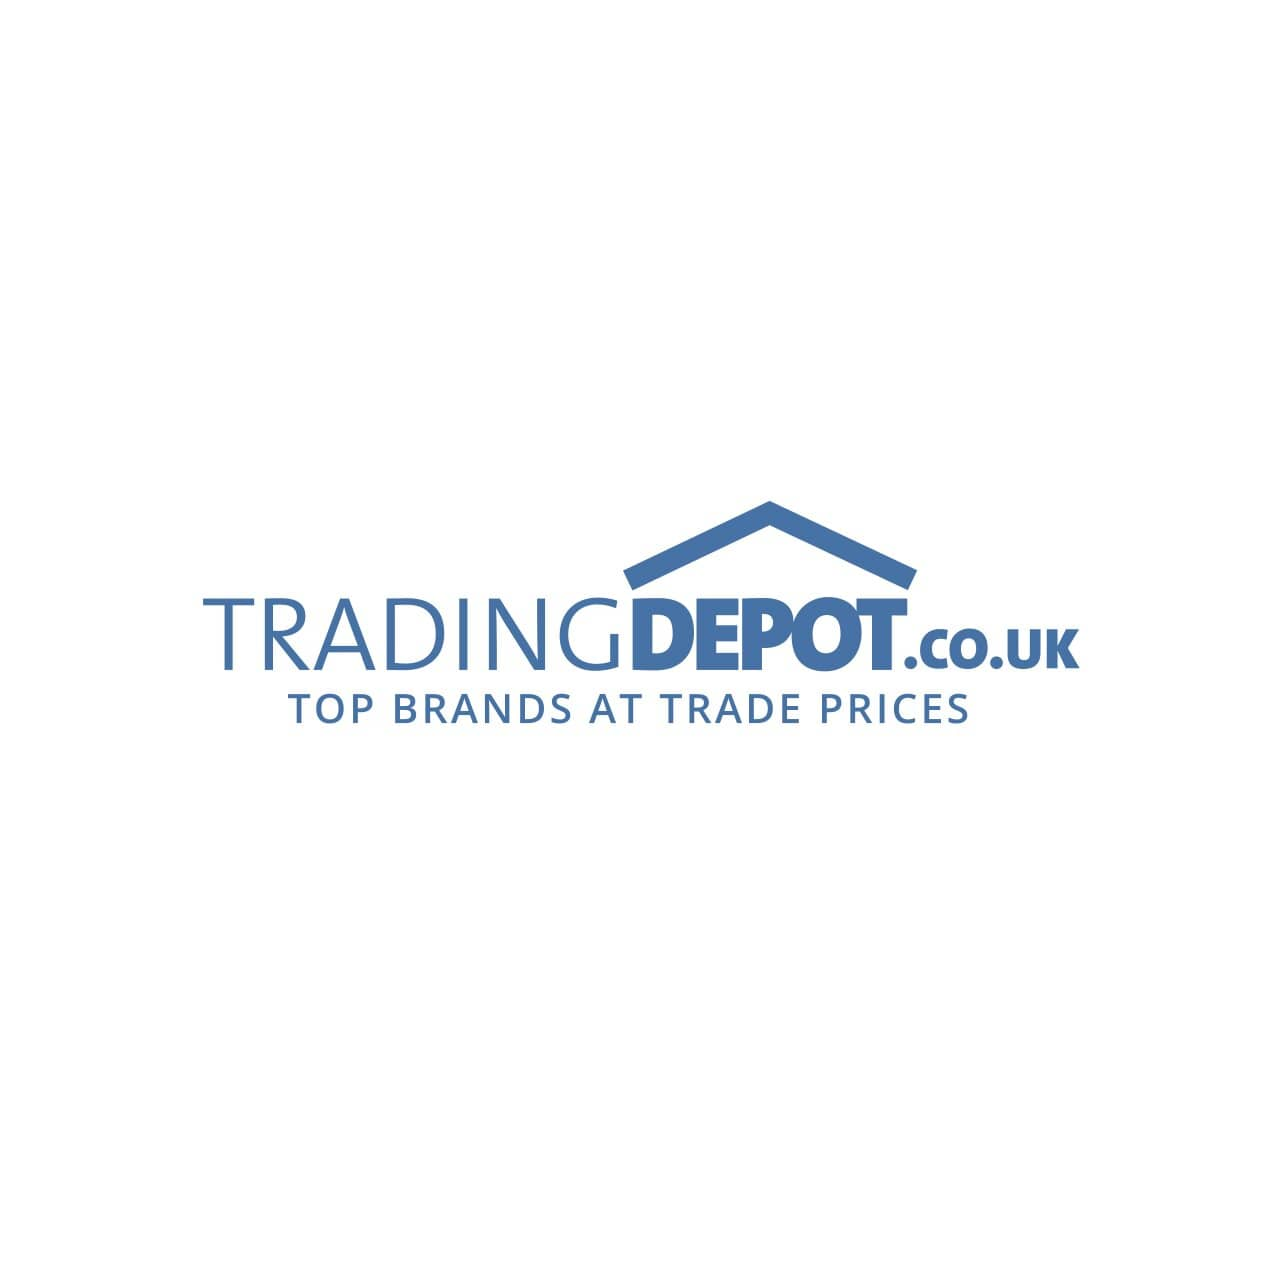 BlueSpot Tools Sanding & Grinding Accessory 31 Piece Kit - B/S19019